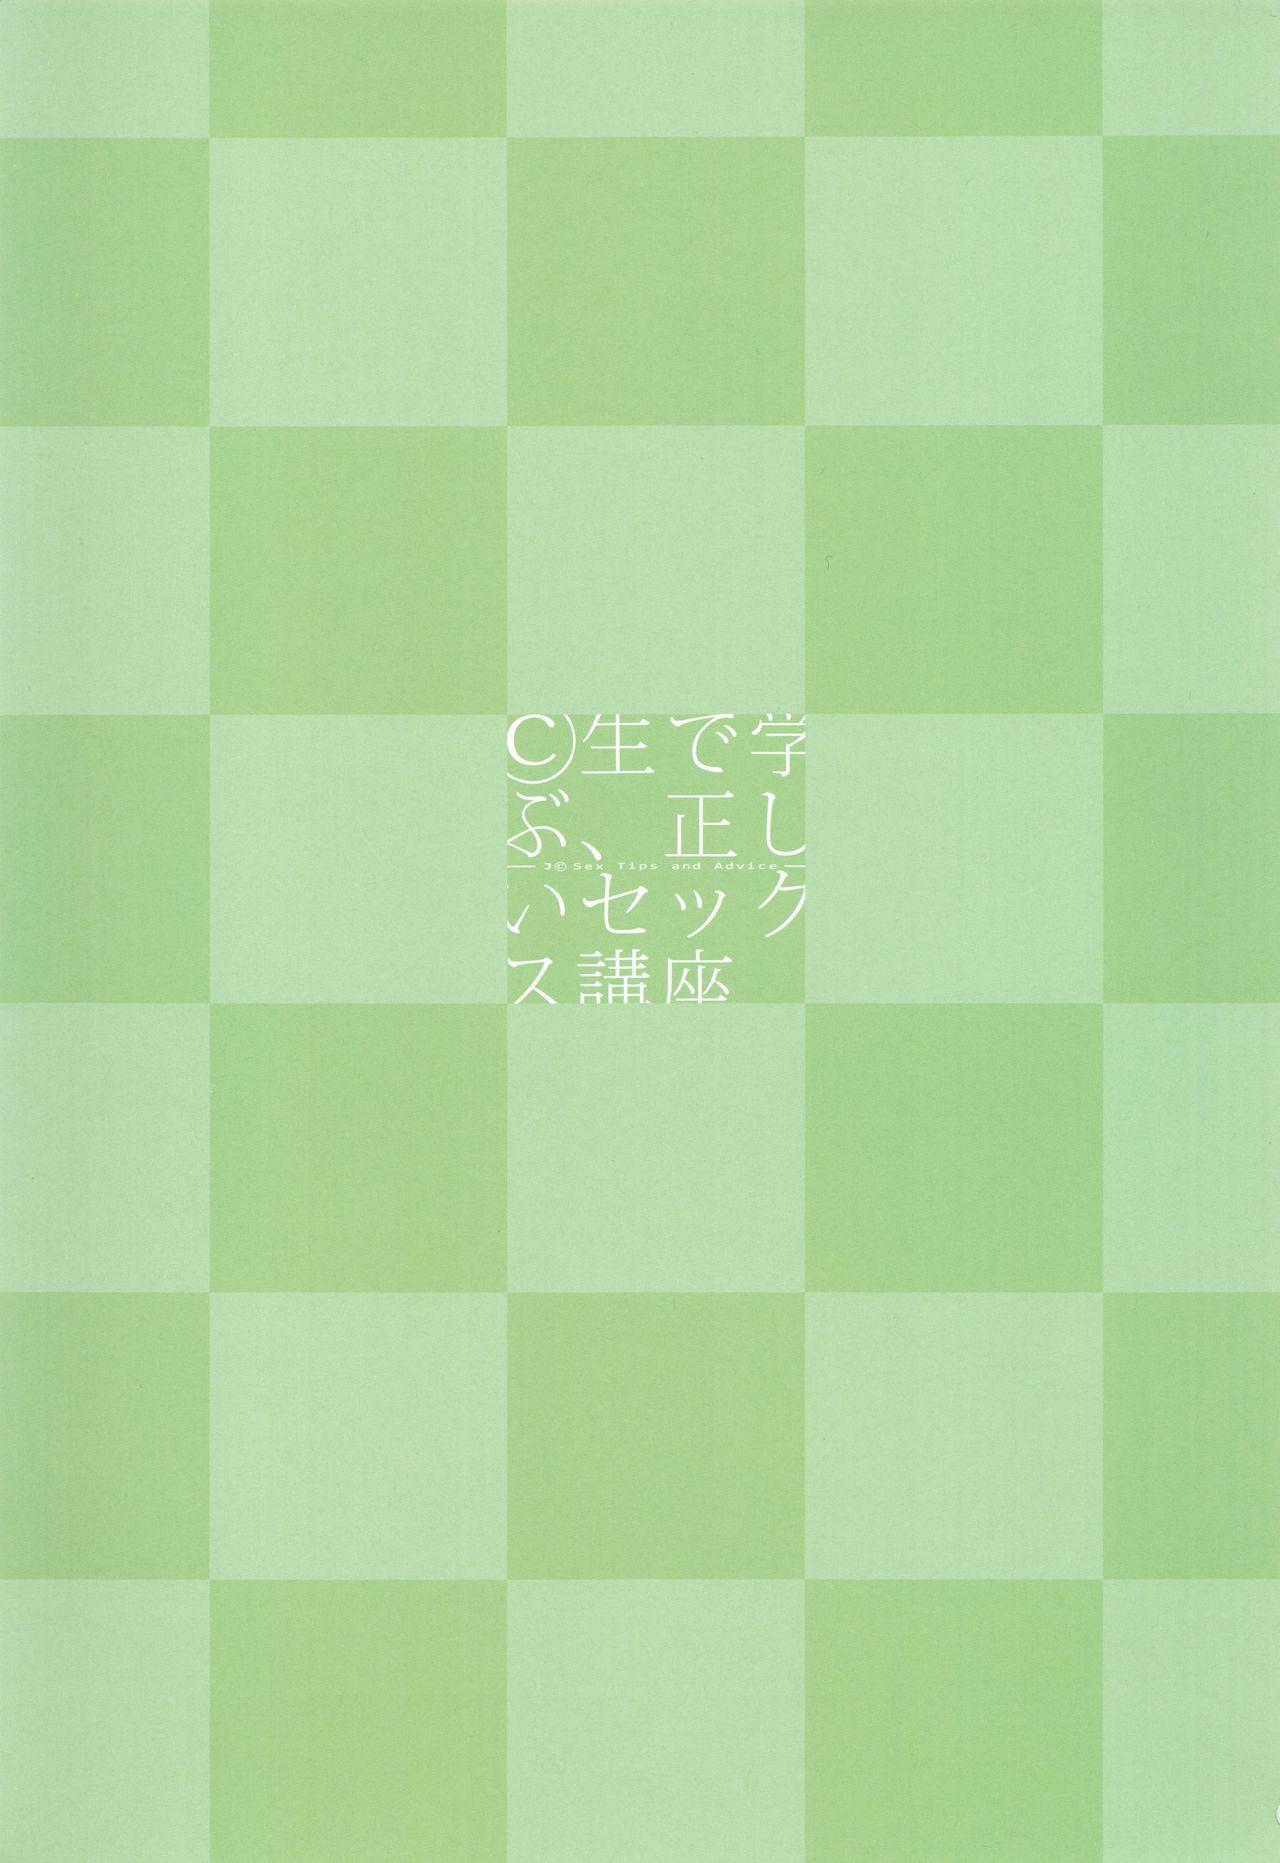 [Peromex (Tamanoi Peromekuri)] ©-sei de Manabu, Tadashii Sex Kouza   JC Hands-On Proper Sex Lecture [English] [bientaimon] [2019-11-09] 1